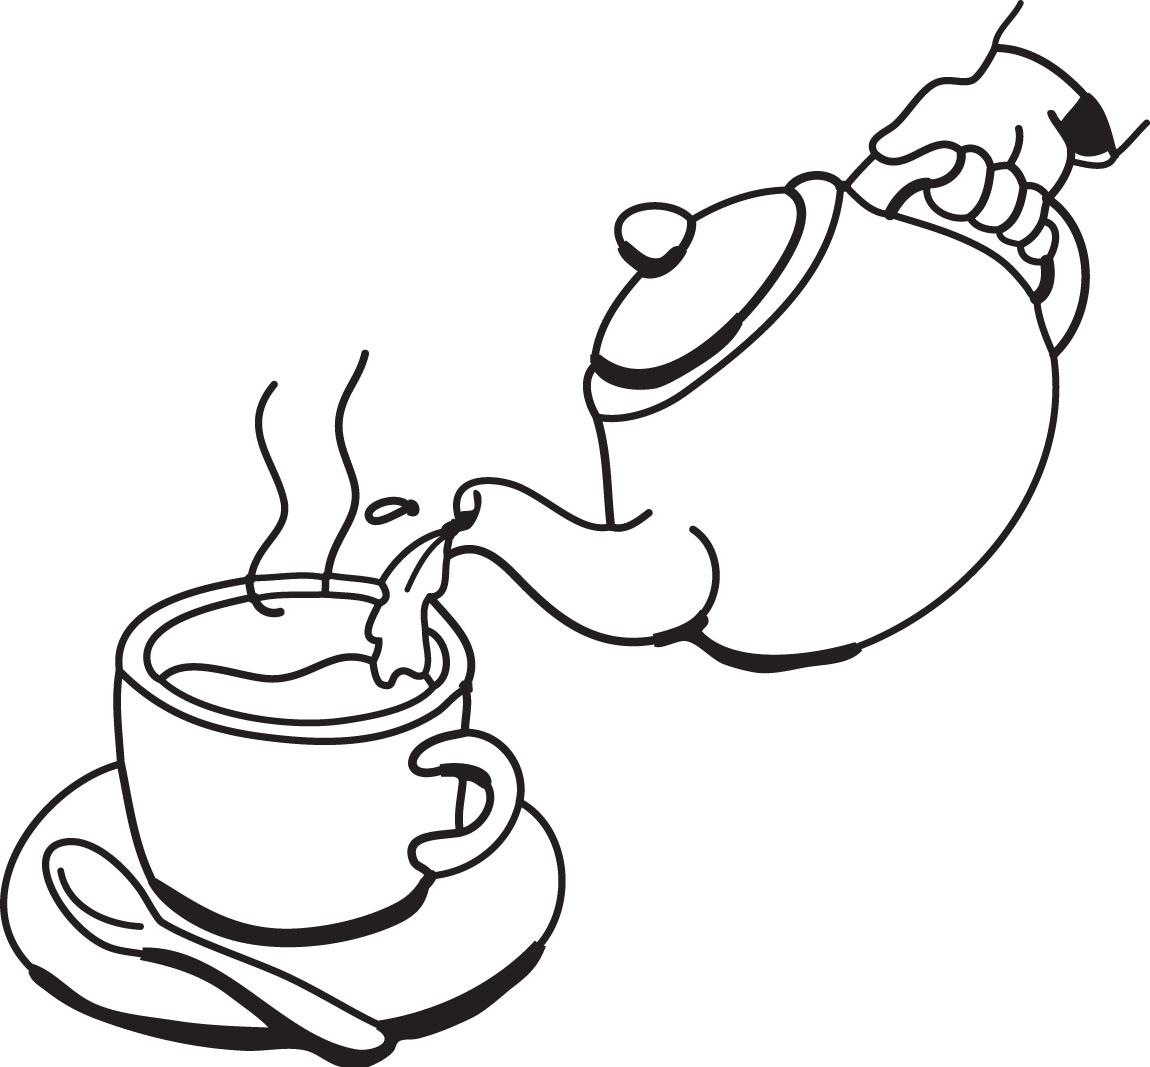 Teapot clip art clipart 2